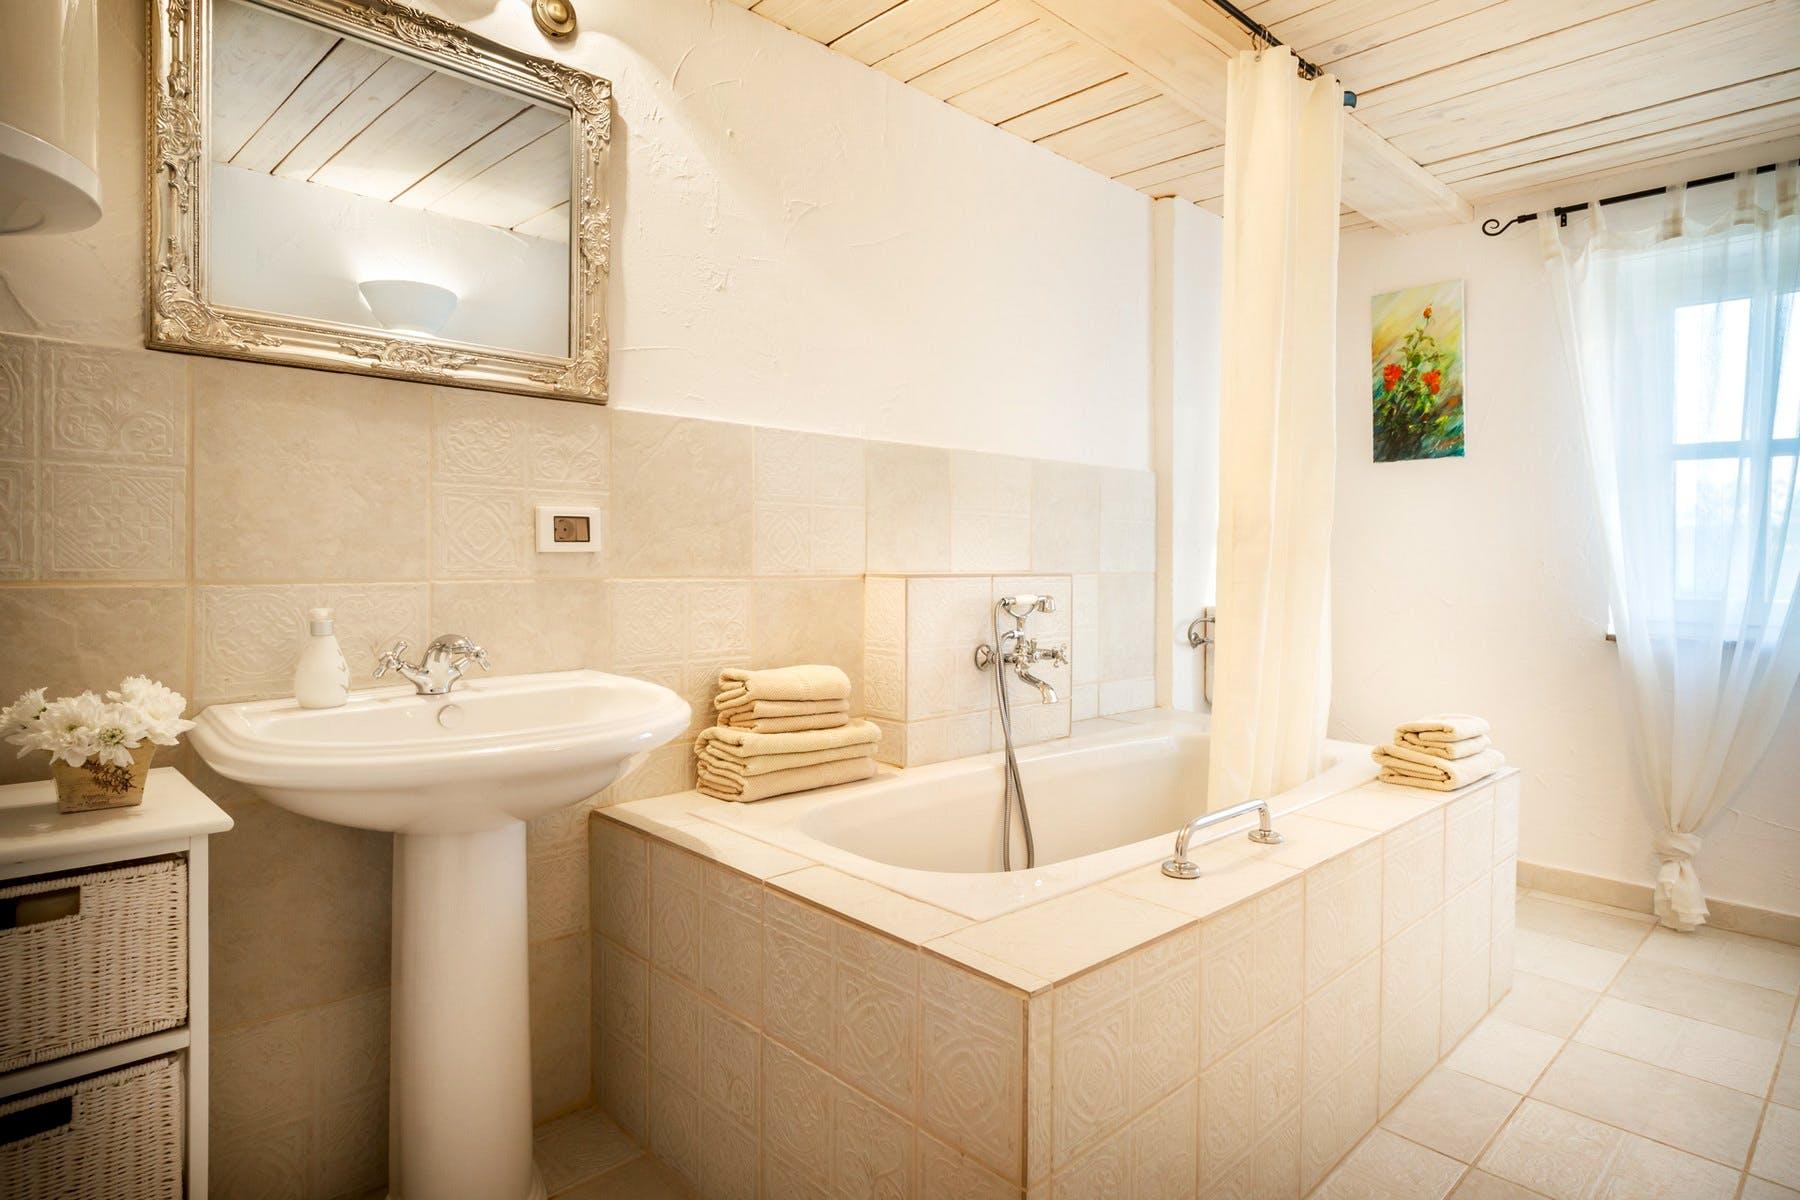 Bathroom with the tub